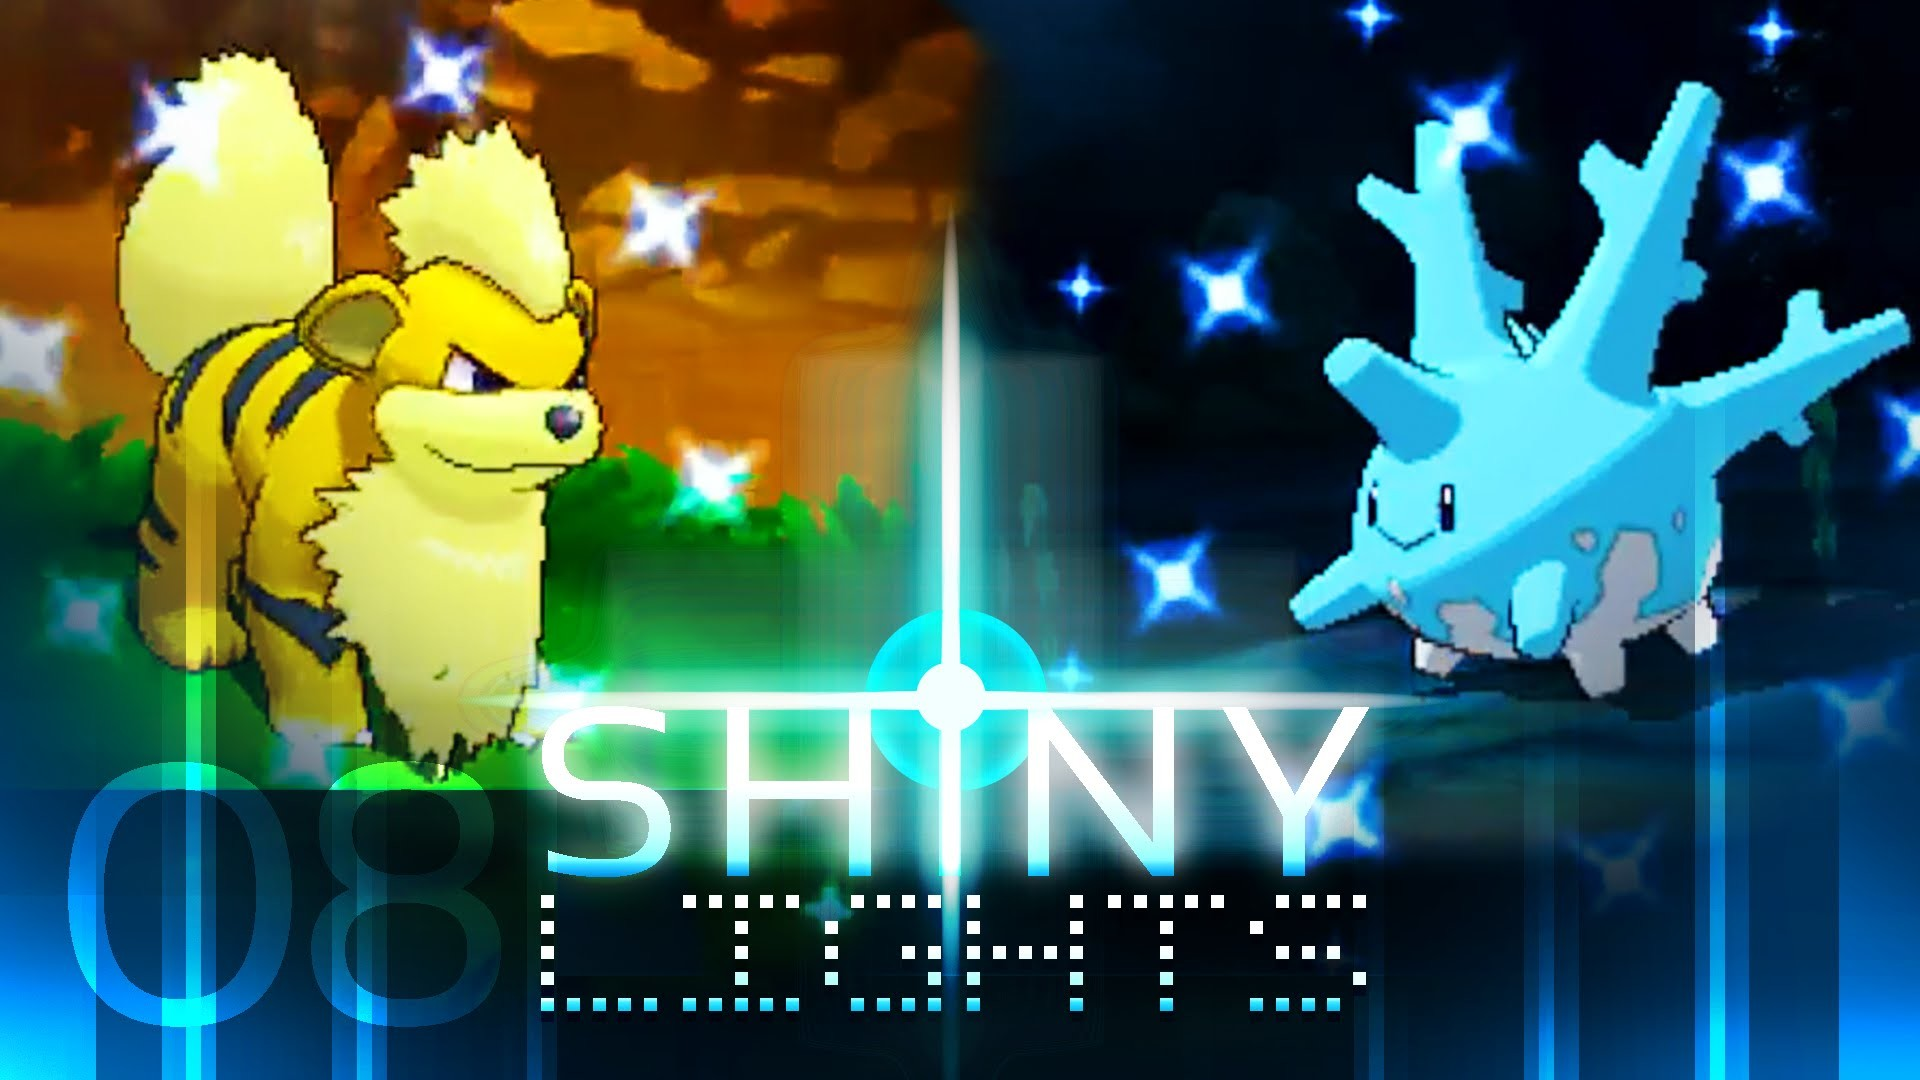 Pokemon ORAS: 3 Shiny Pokemon in 1 Day! Growlithe, Corsola & Wailmer  (Twitch) (Omega Ruby) – YouTube